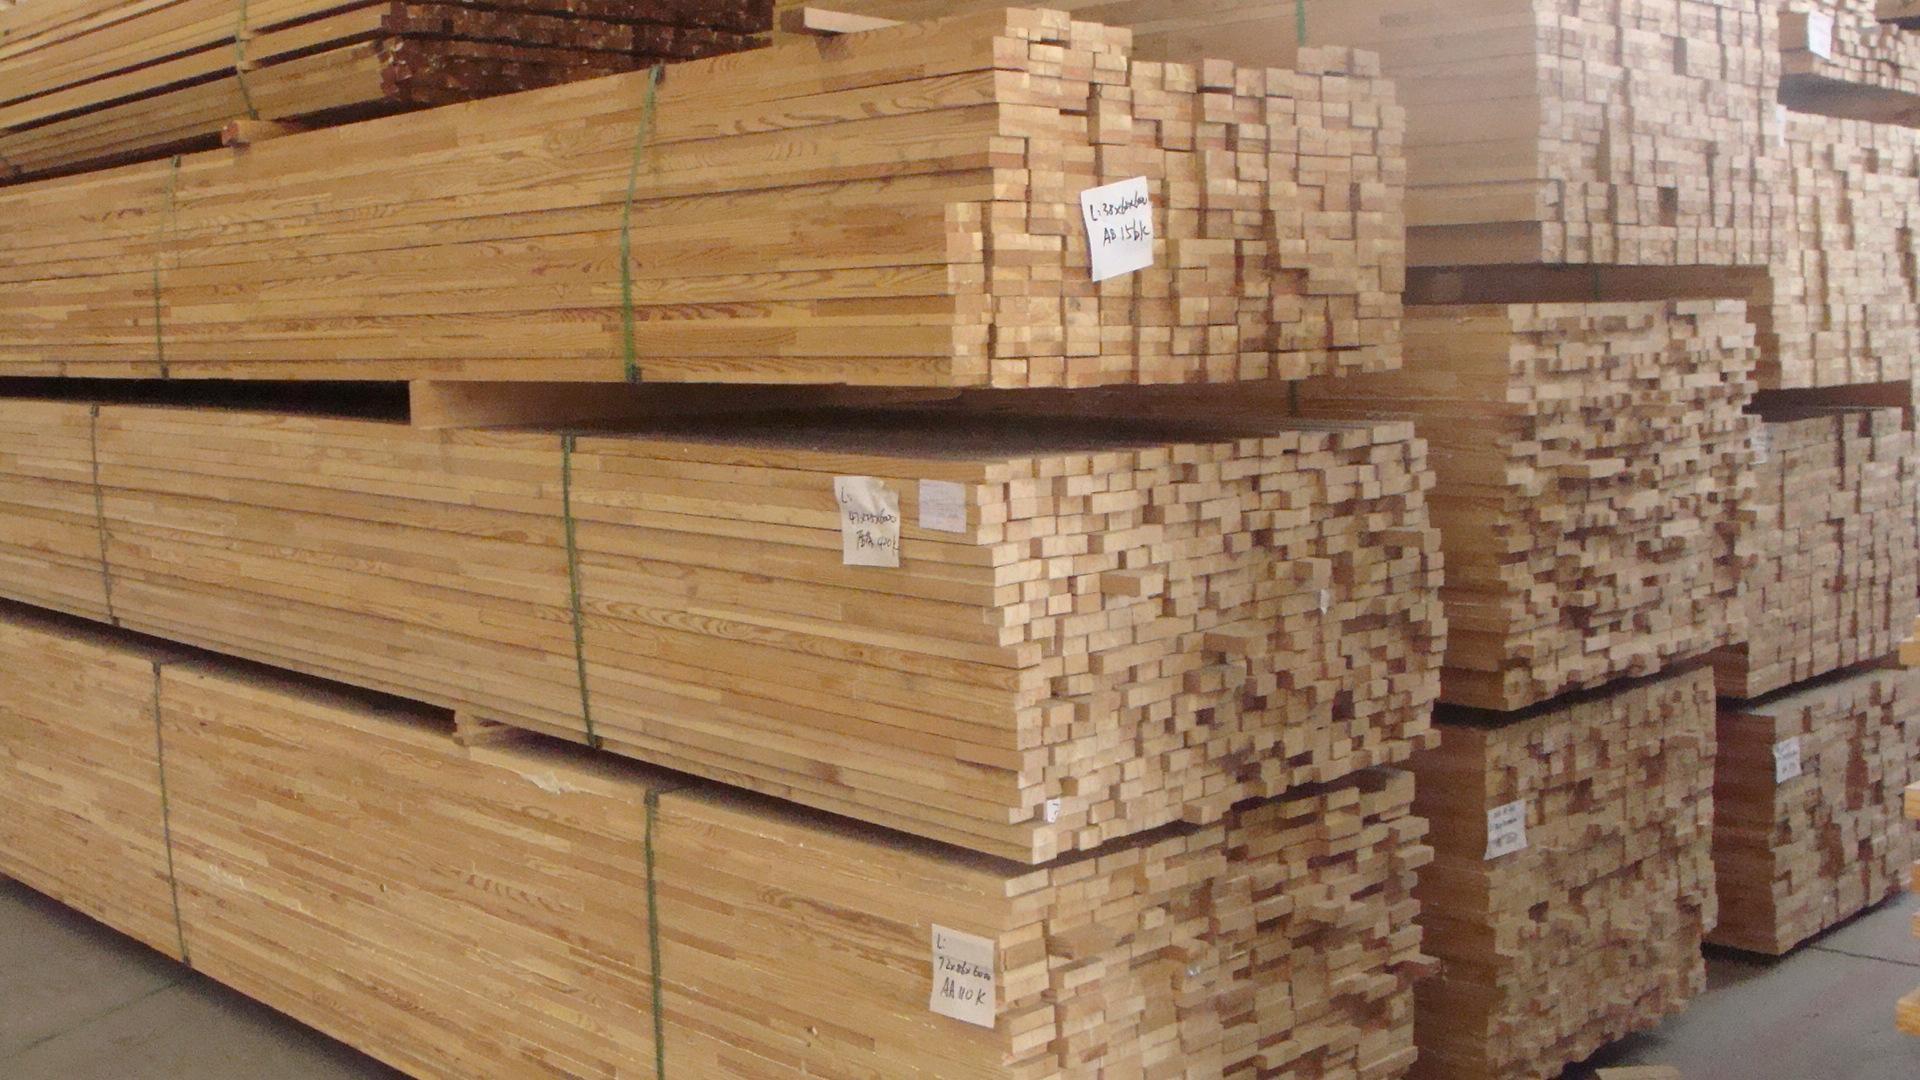 Maderas el castor maderas el castor ltda - El castor muebles ...